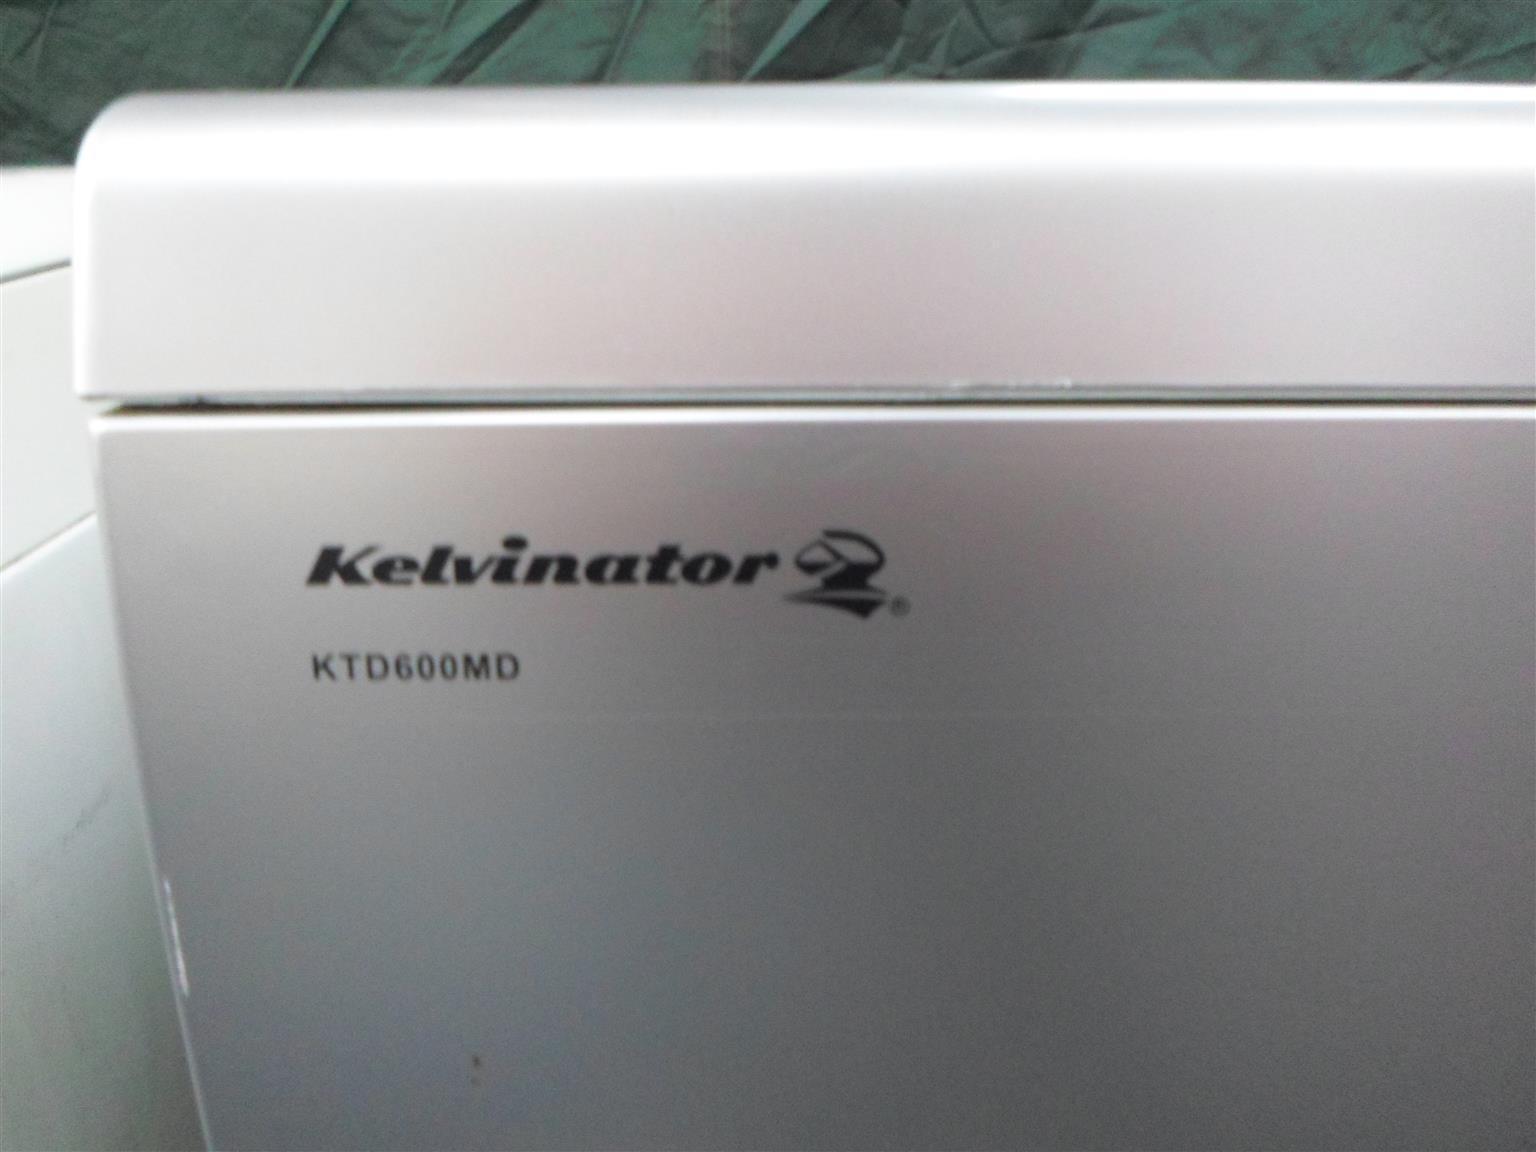 Kelvinator KTD600MD Tumble Dryer - C033055924-1